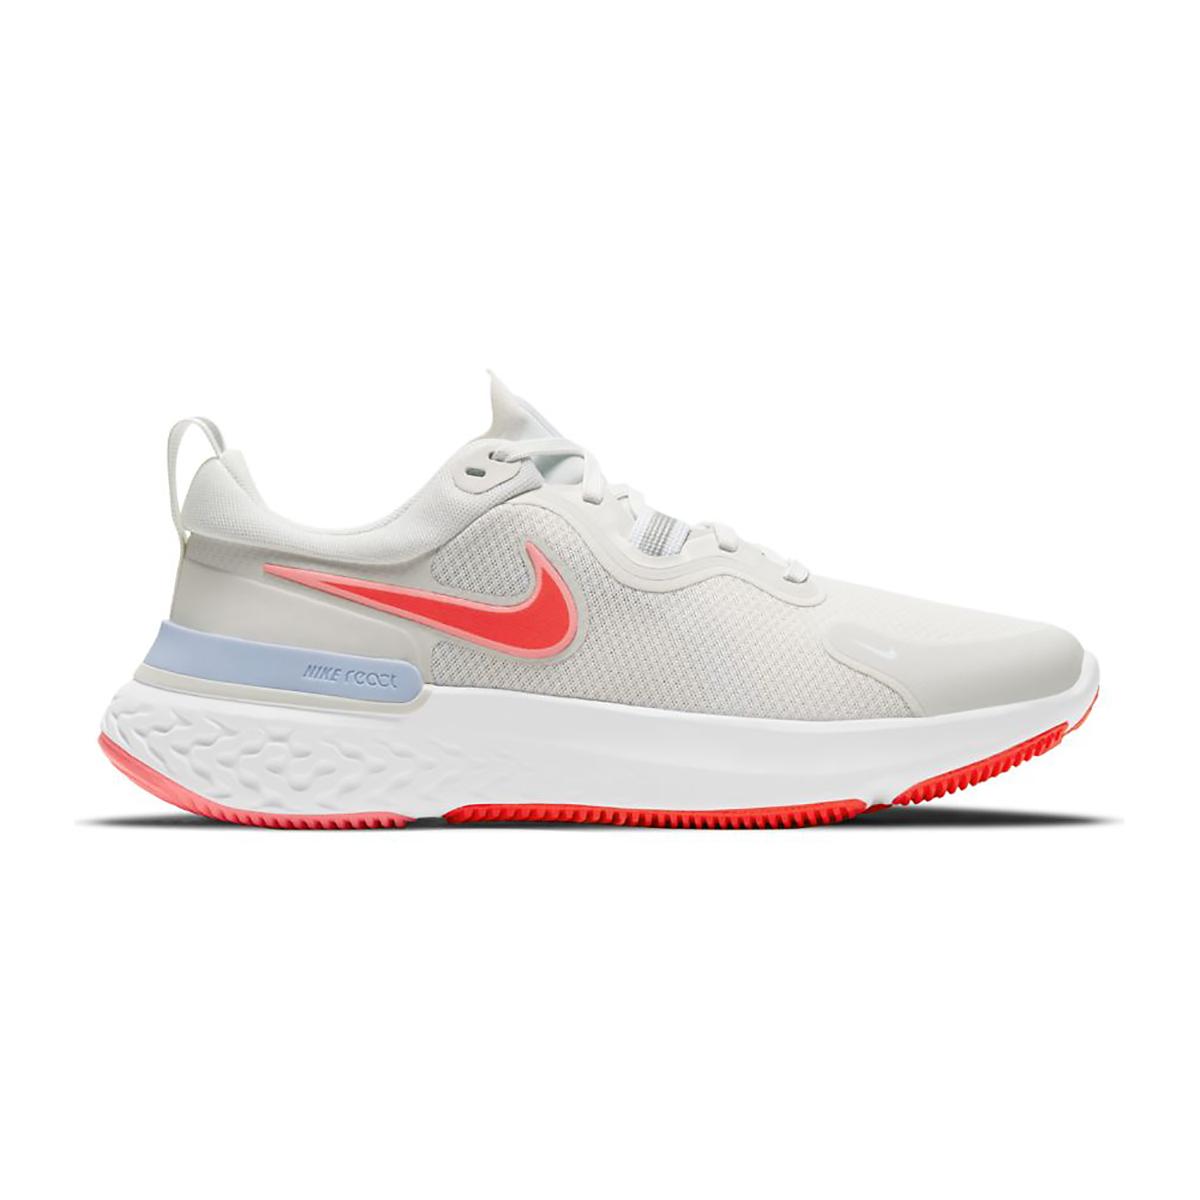 Women's Nike React Miler Running Shoe - Color: Platinum Tint/Bright Chrimson - Size: 5 - Width: Regular, Platinum Tint/Bright Chrimson, large, image 1